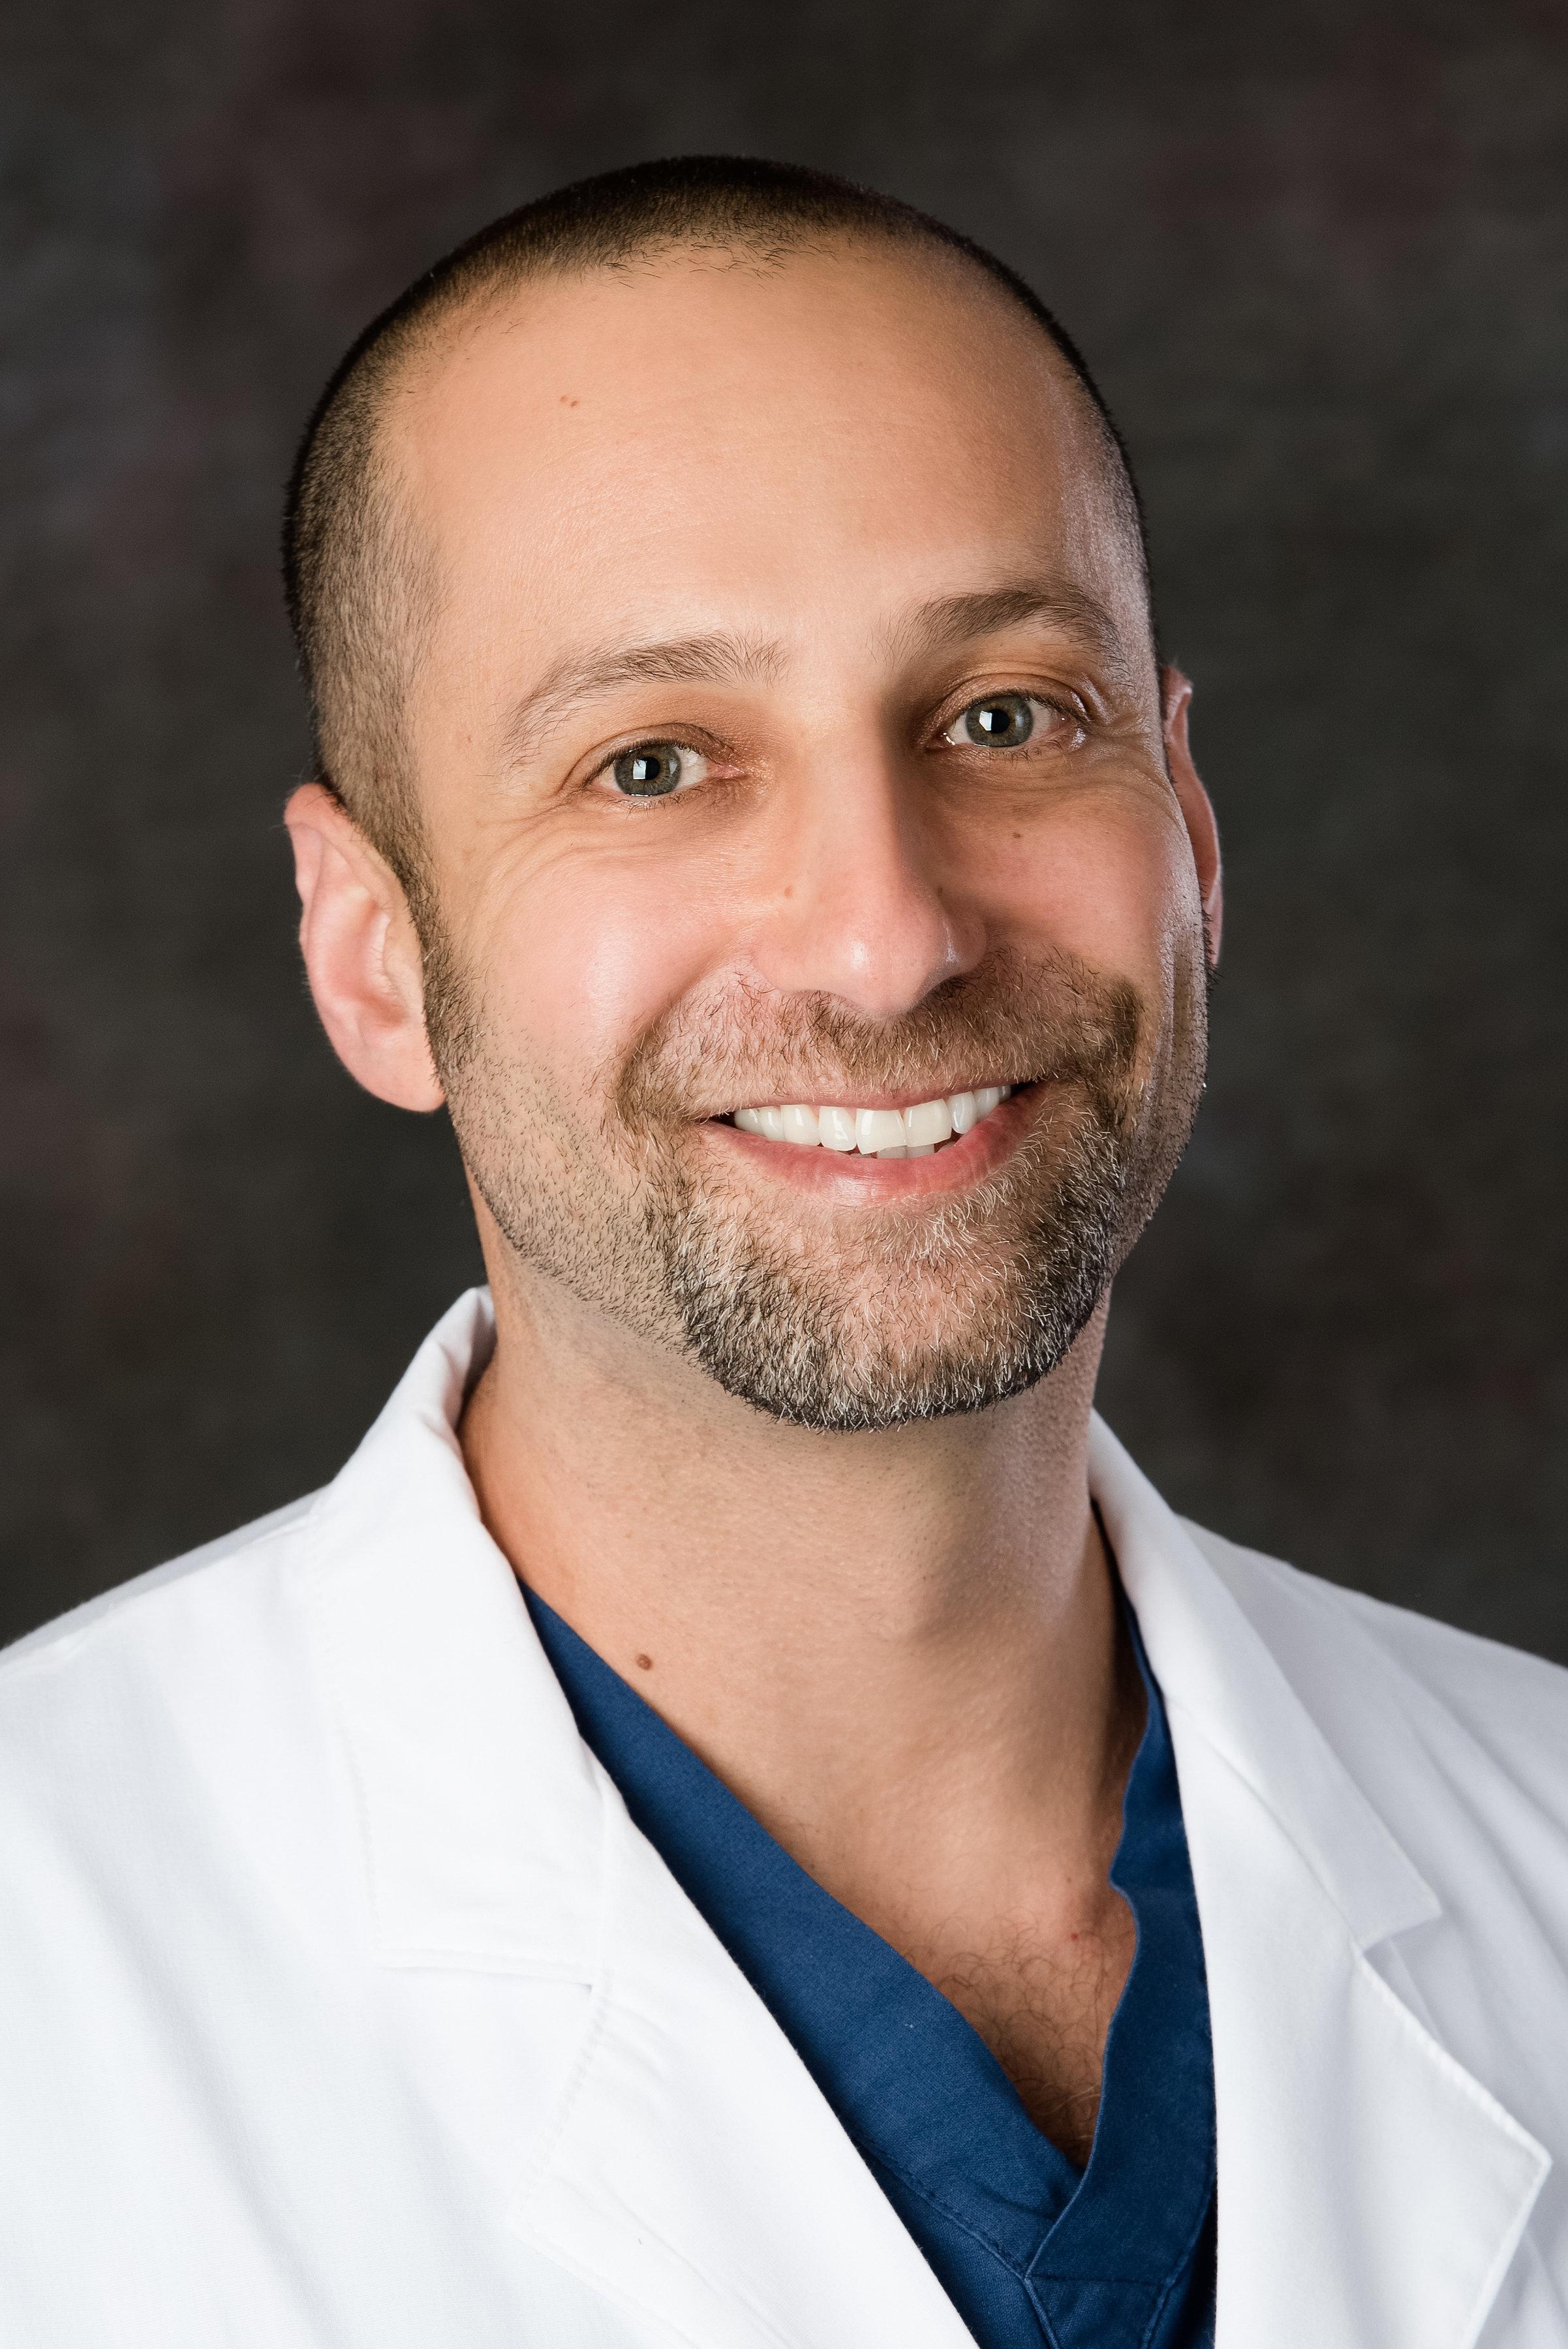 Dr. Gad Silberman